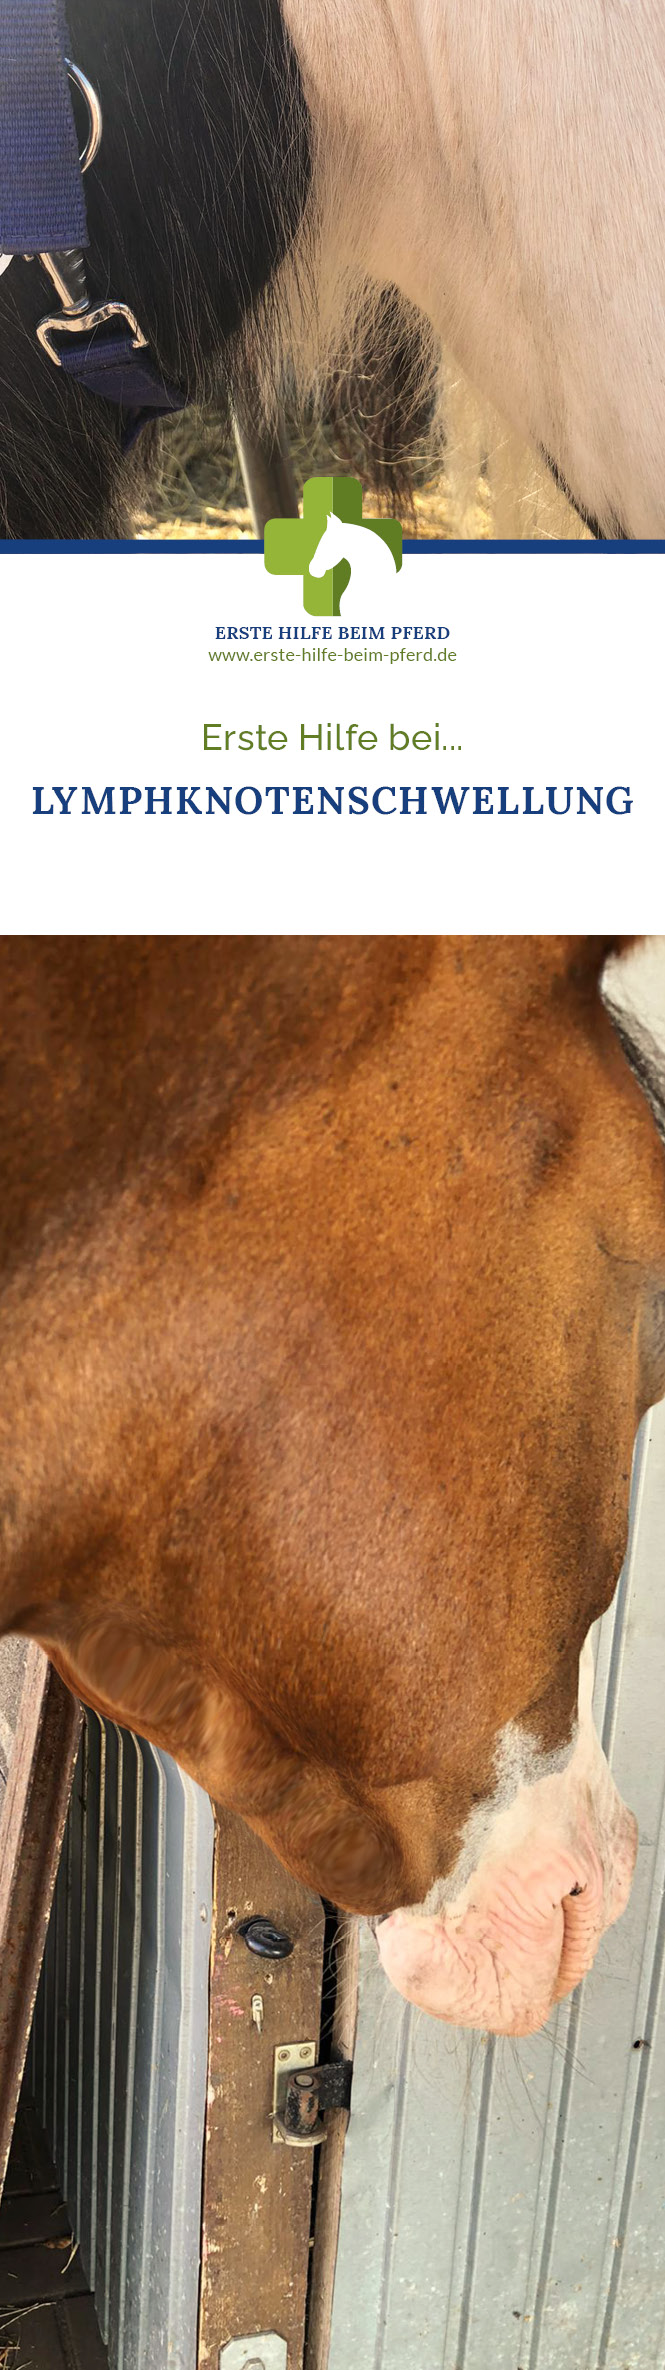 Pferd hat Lymphknotenschwellung